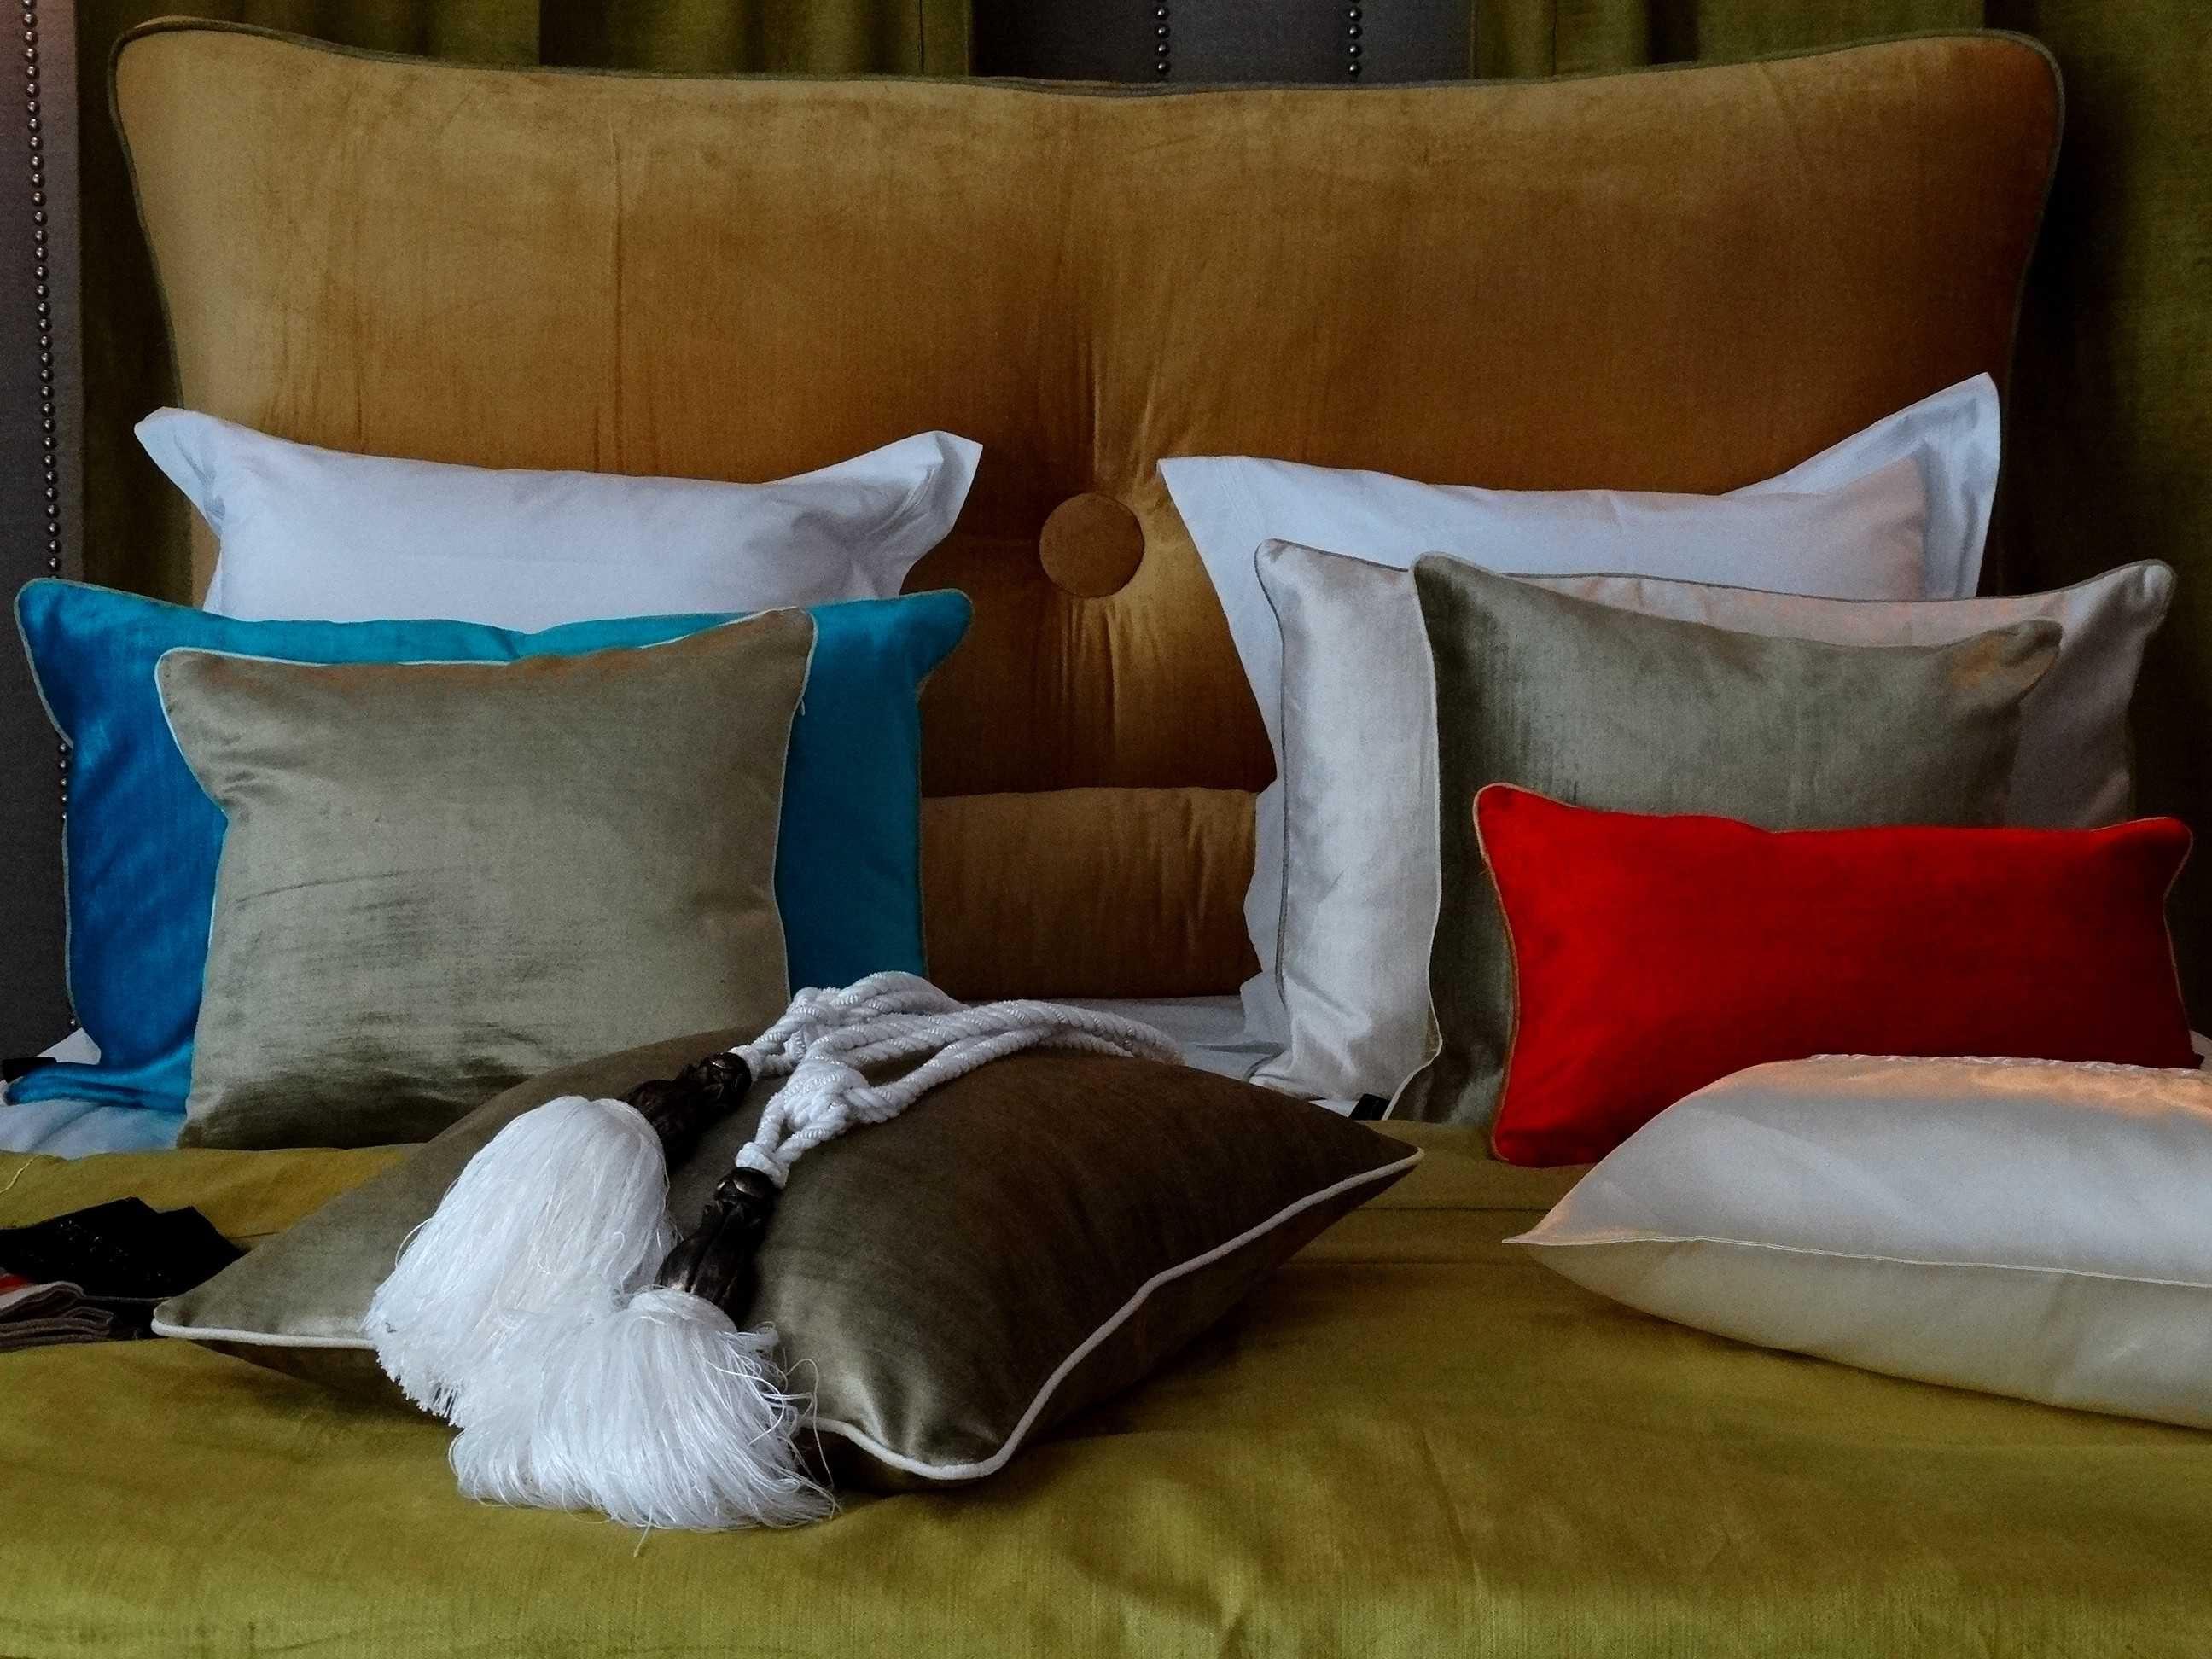 Martha Stewart Sofa Saybridge Review Awesome Sofas Tête De Lit Sur Mesure En Velours Lavé Orange Sandra